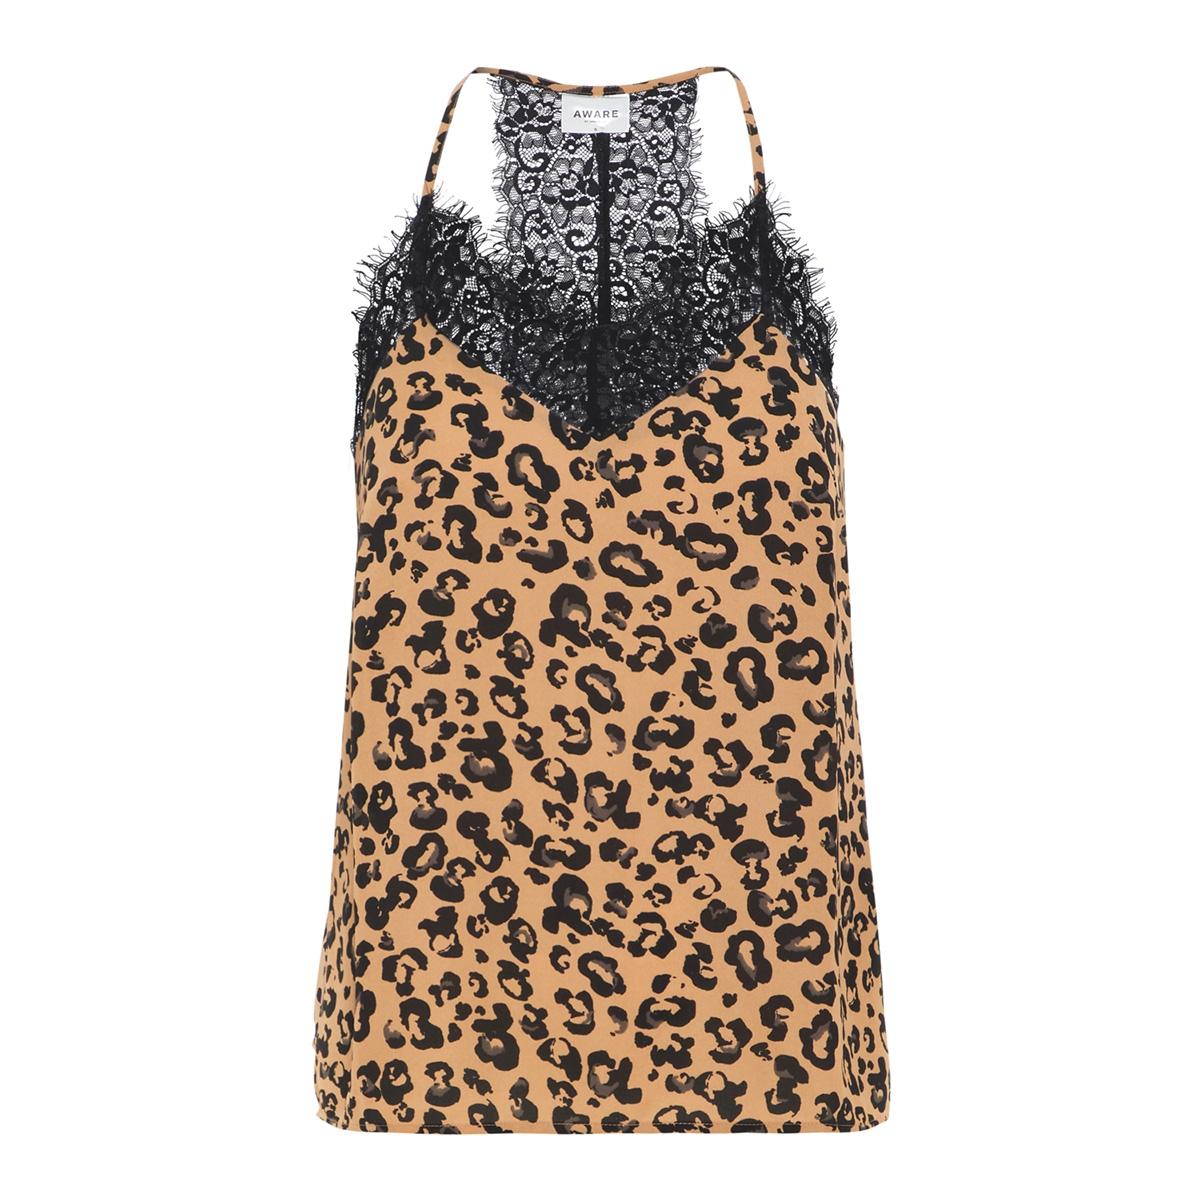 vmgreen lace singlet vma 10216637 vero moda top indian tan/anni